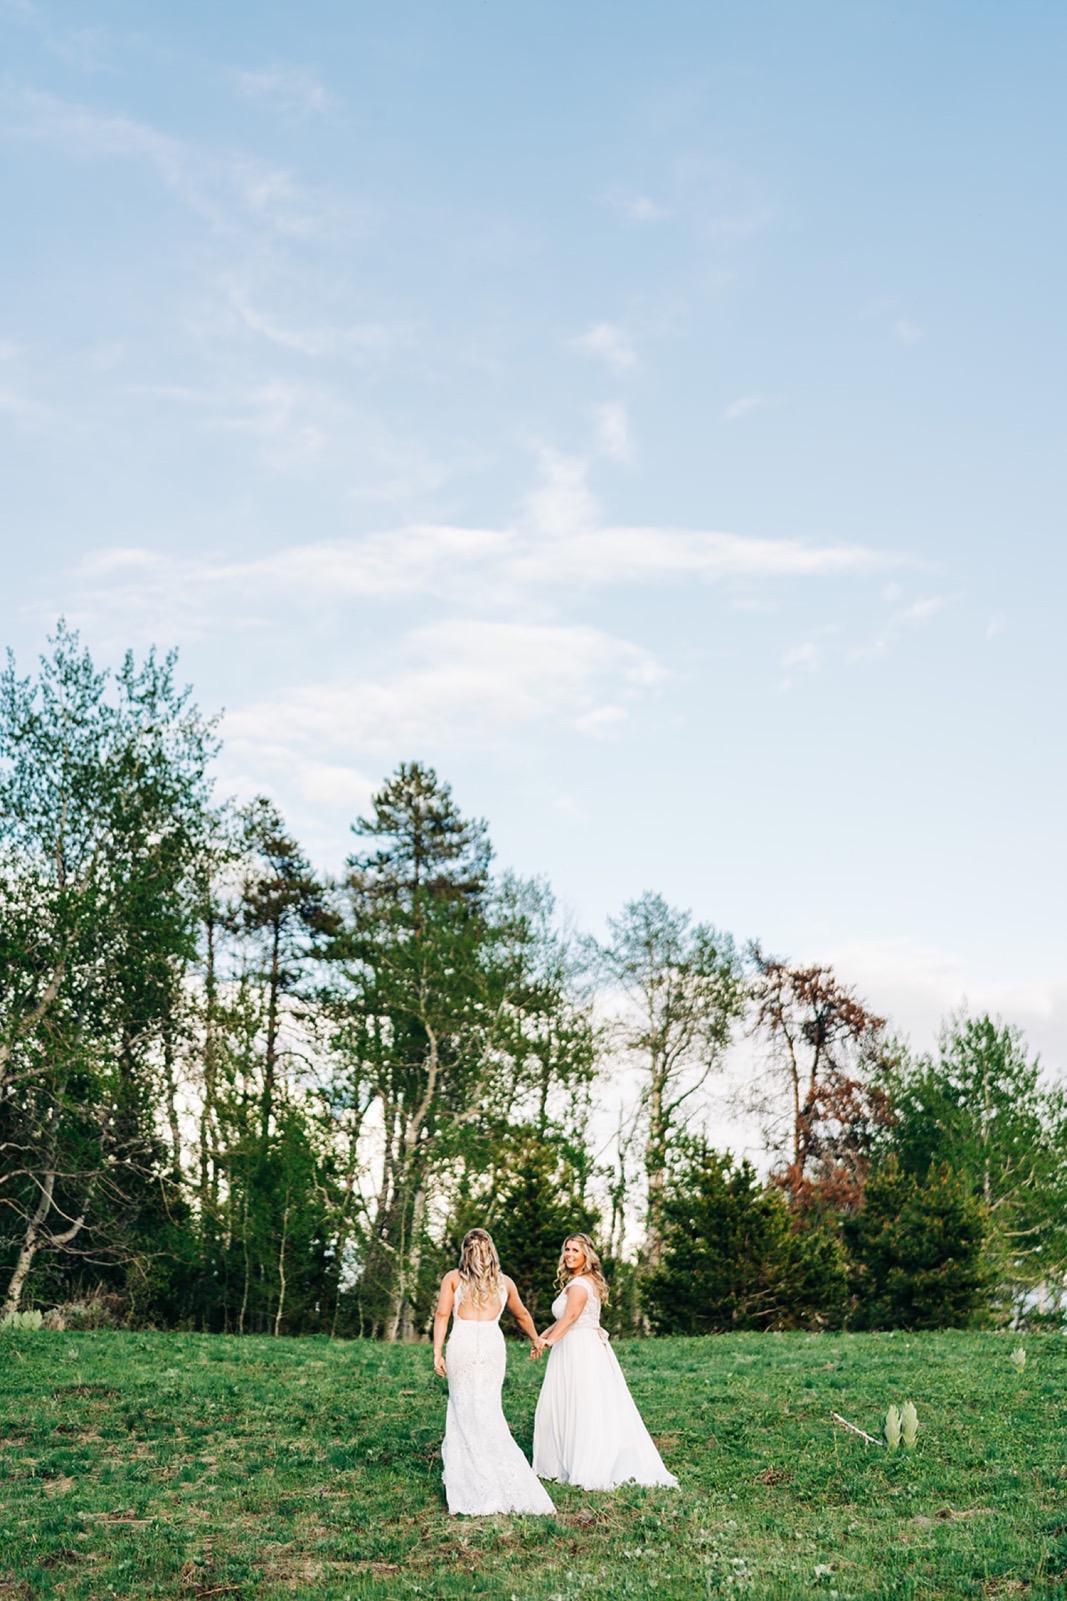 183_falissa_heather_wedding-518.jpg